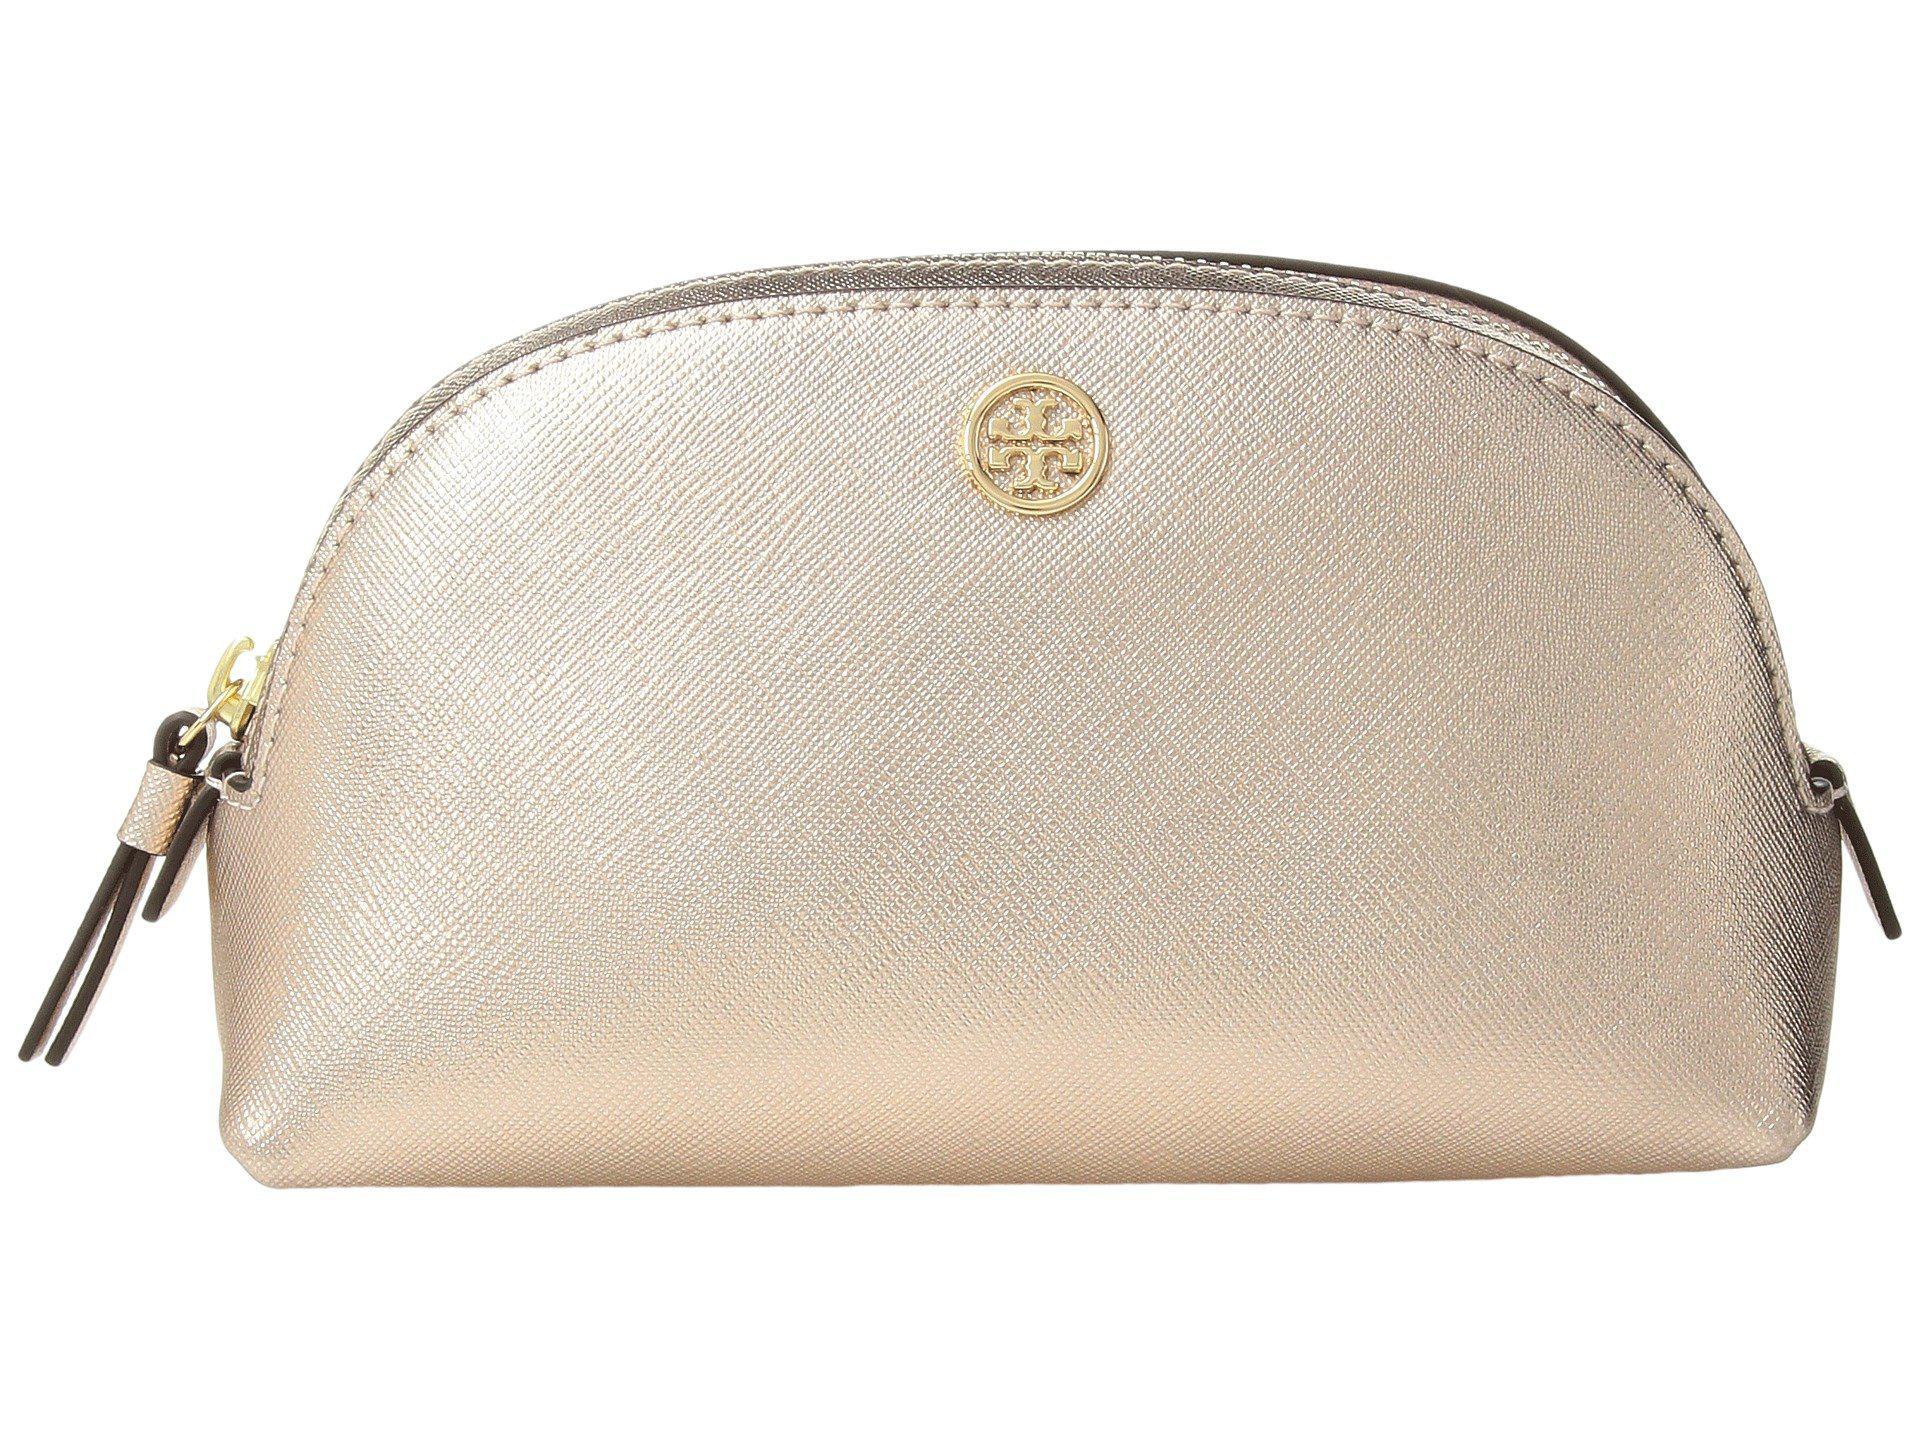 6277bd8f361f Lyst - Tory Burch Robinson Metallic Small Makeup Bag (light Rose ...